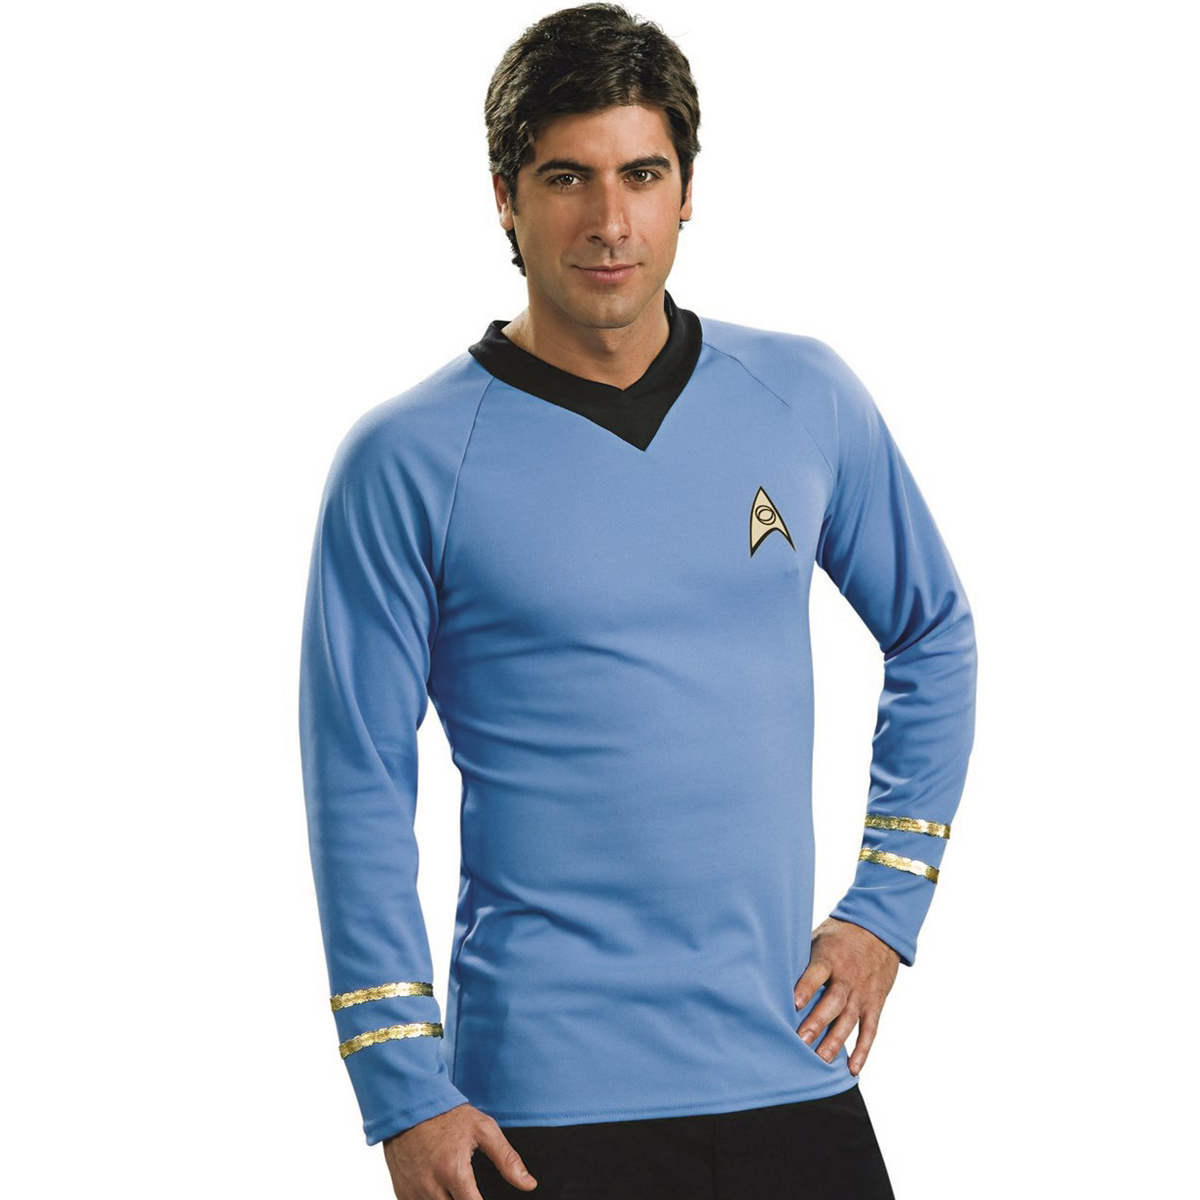 Star Trek Men's Deluxe Captain Kirk Costume